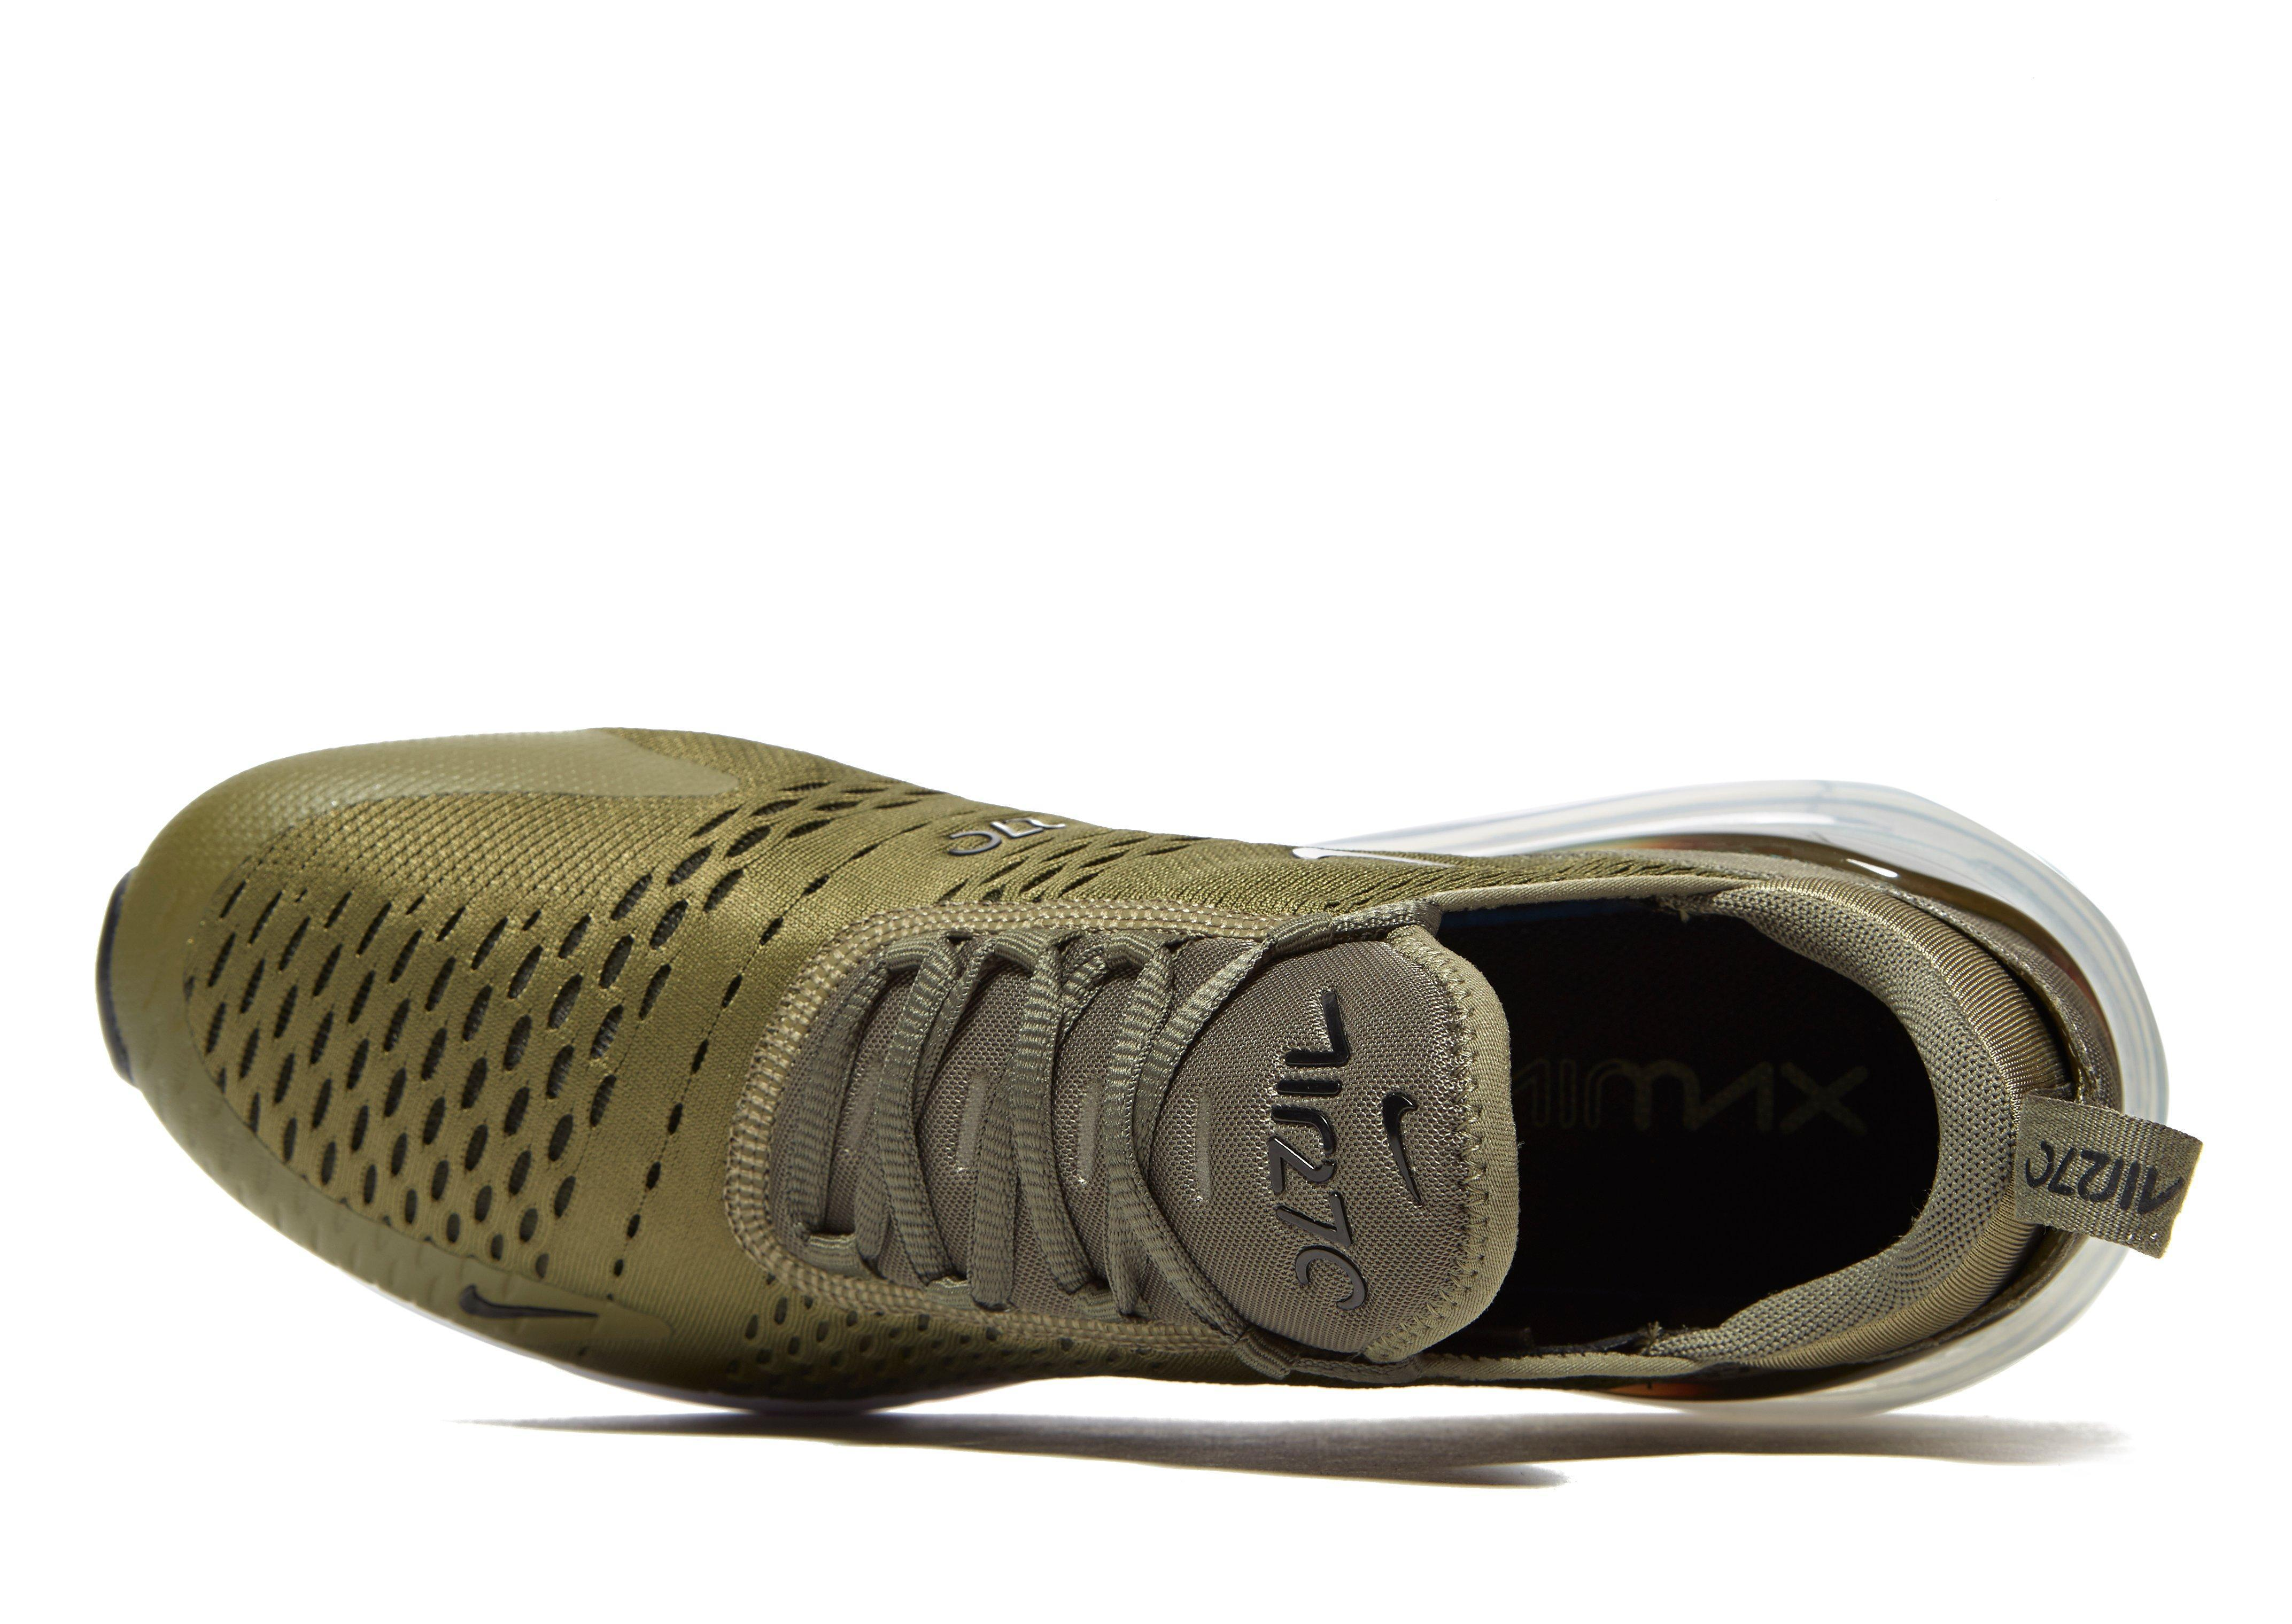 best website 543c1 121c7 Nike Air Max 270 in Green - Lyst